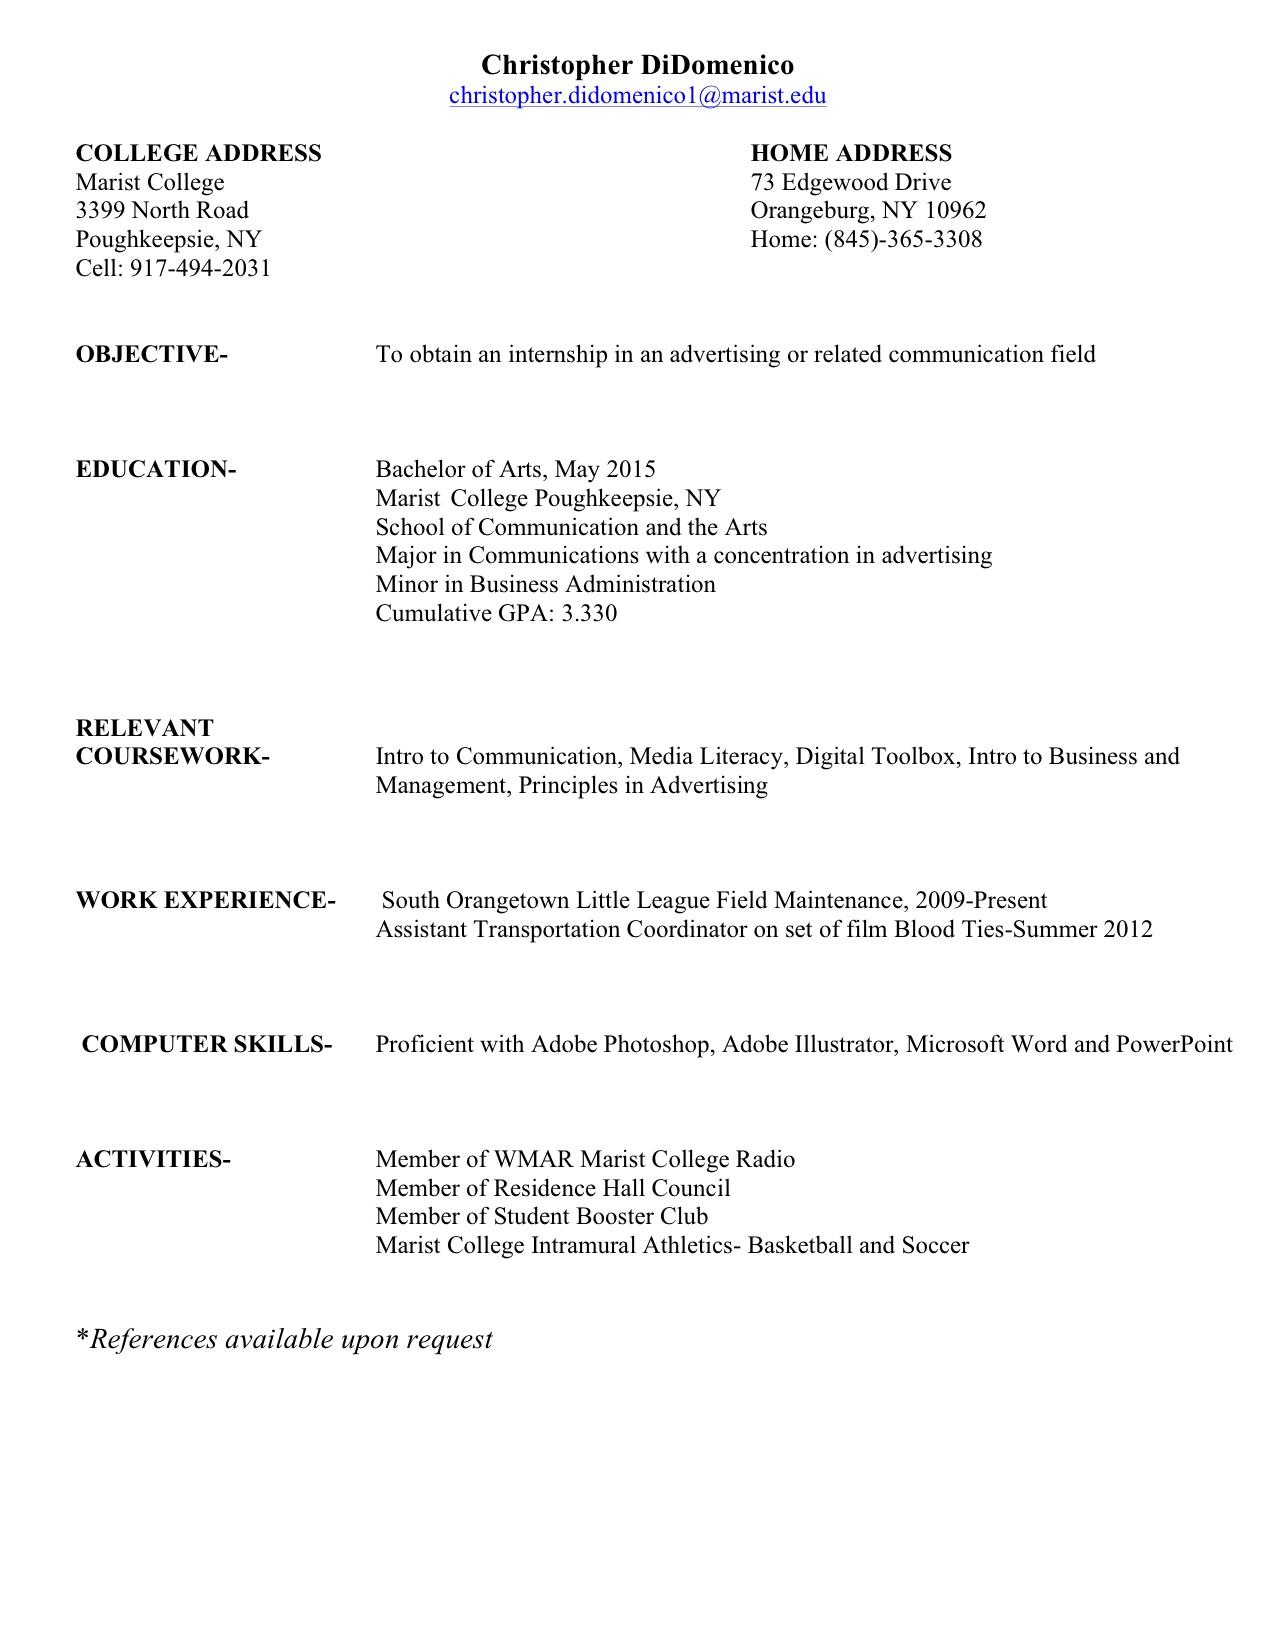 resume draft resume builder resume draft resume draft resume tips resume templates cover resume rough draft